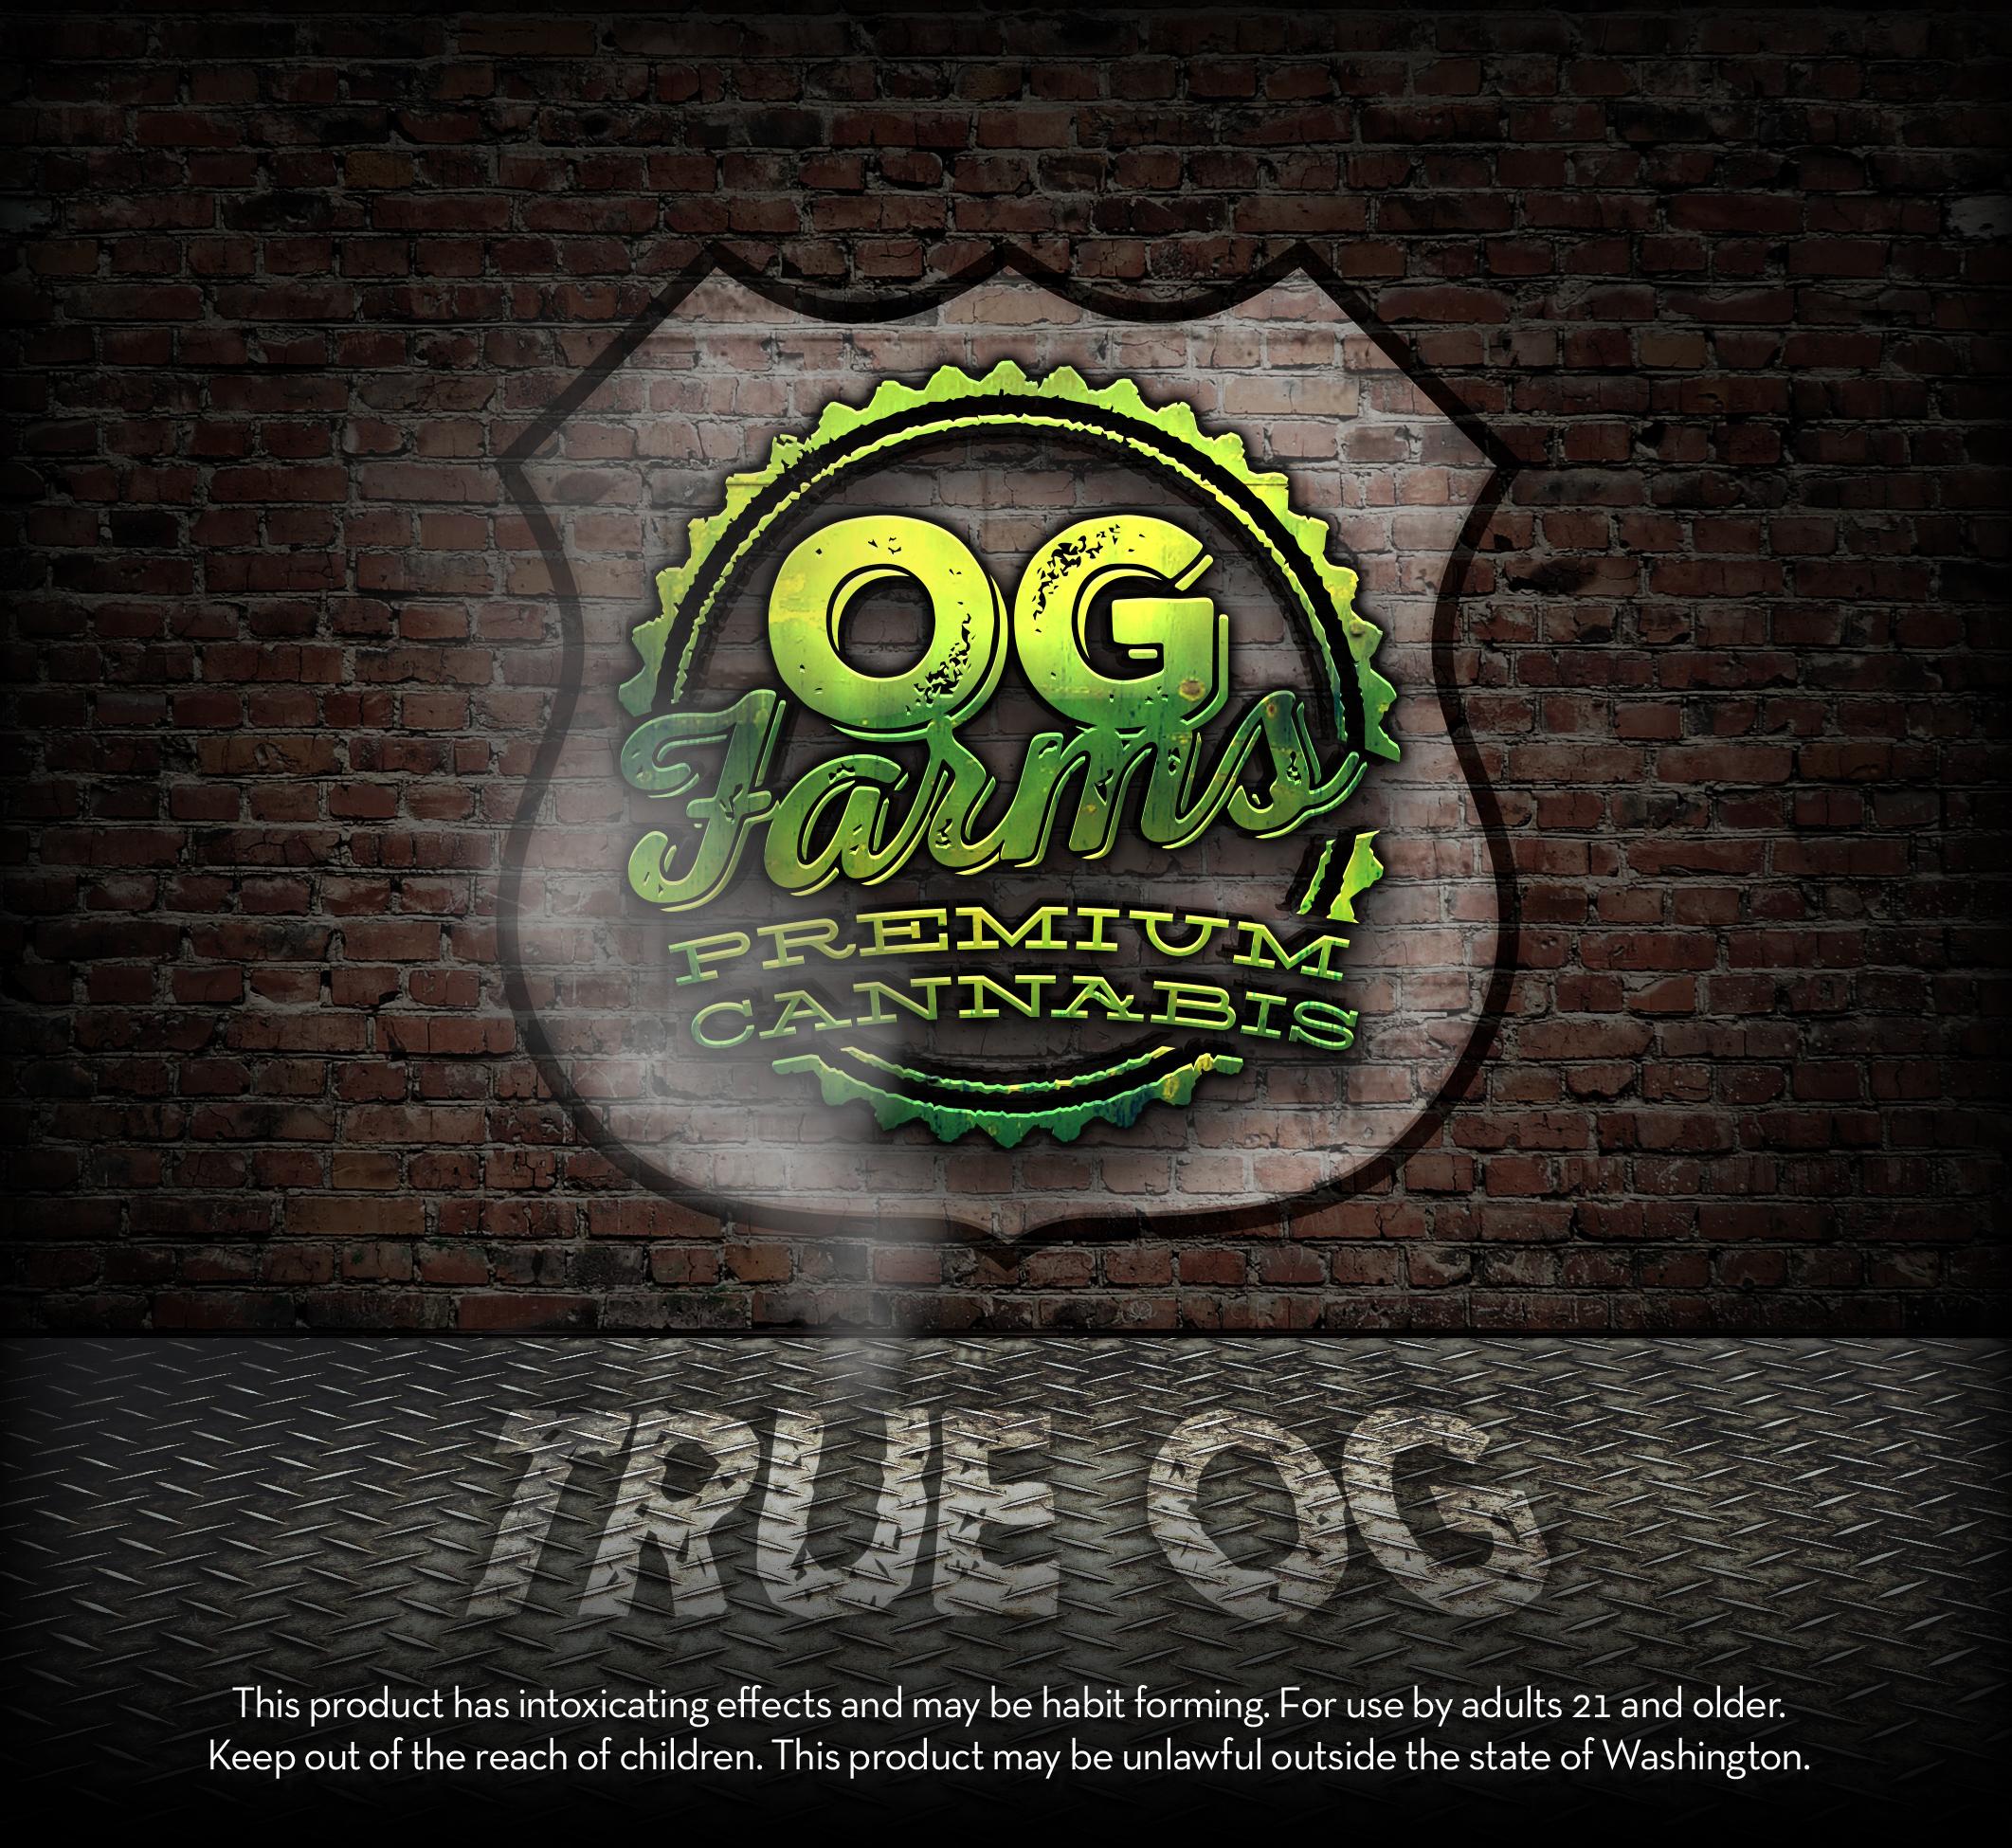 OG Farms TRUE OG Cannabis Label